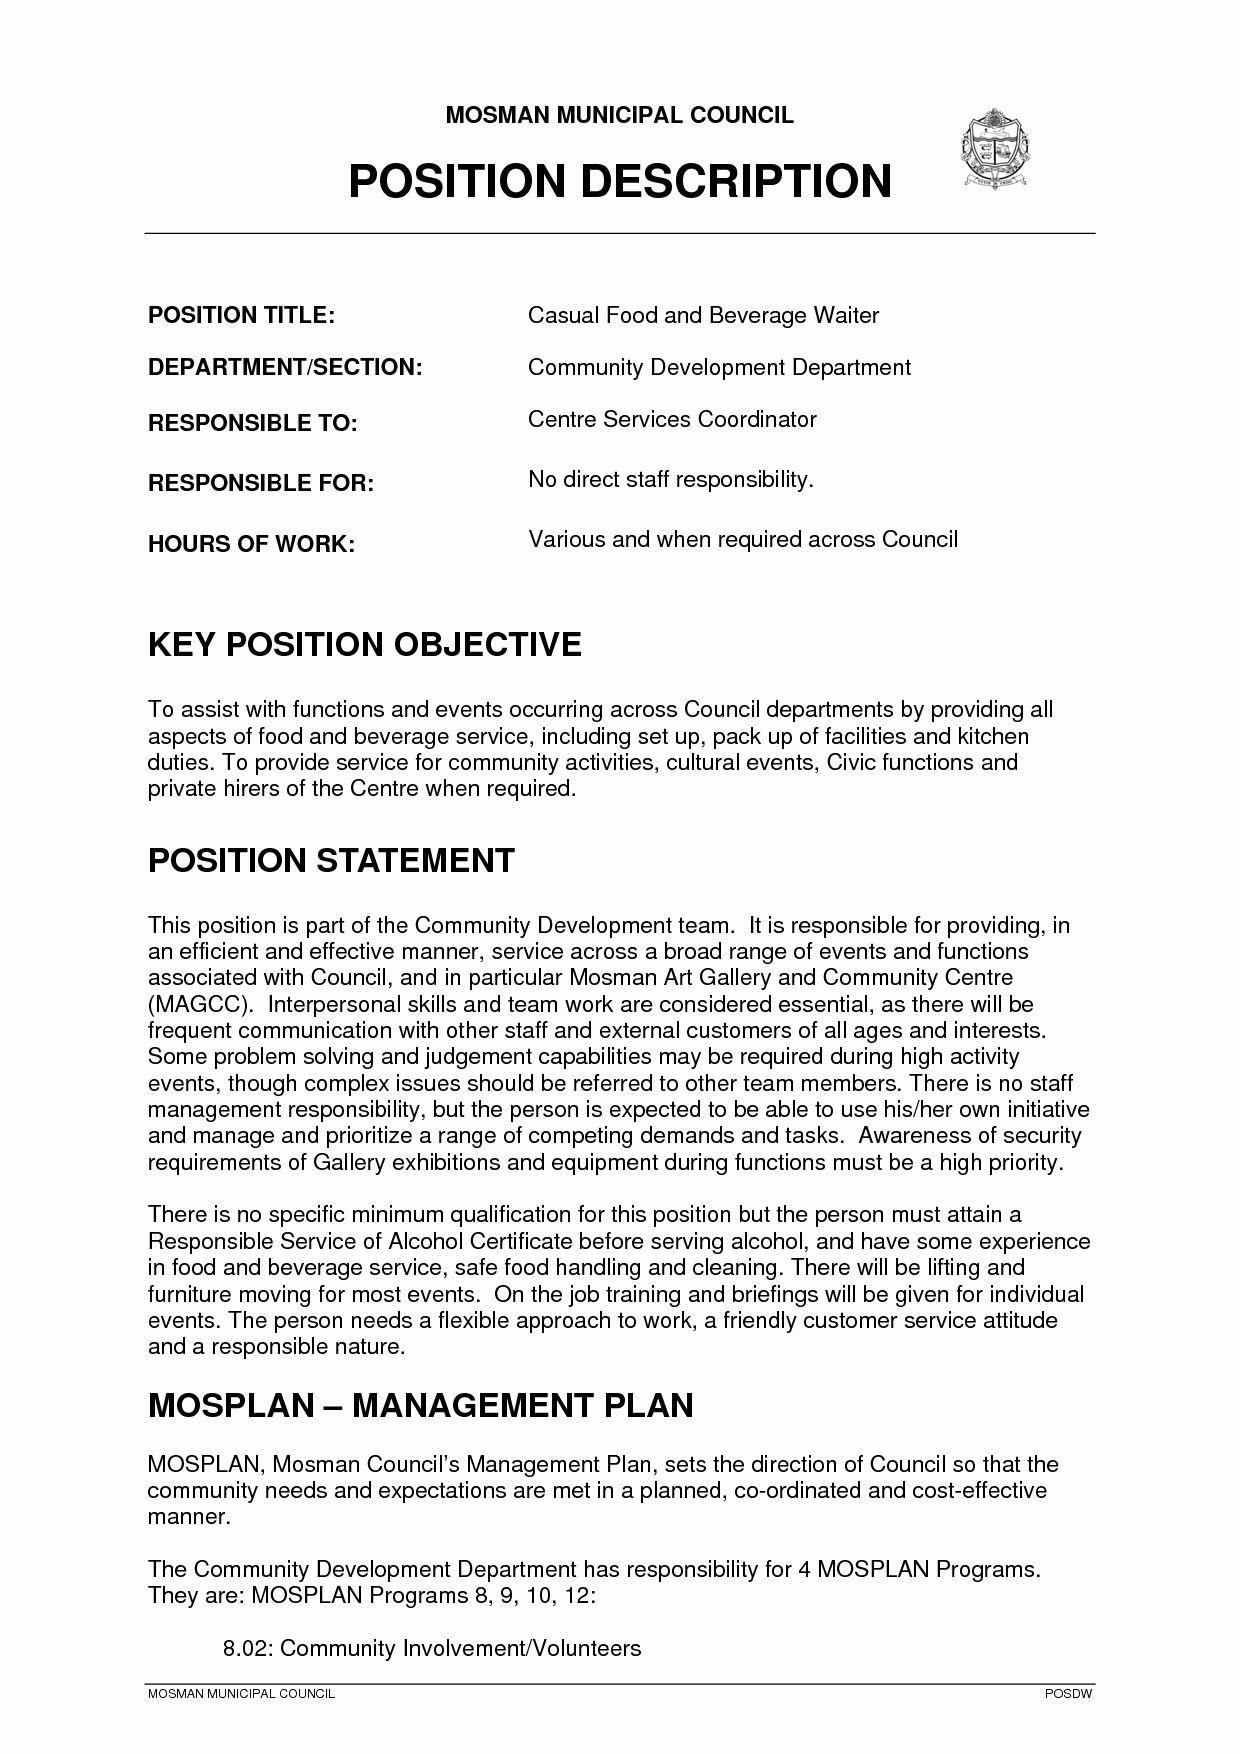 23 Server Job Description Resume in 2020 Job resume